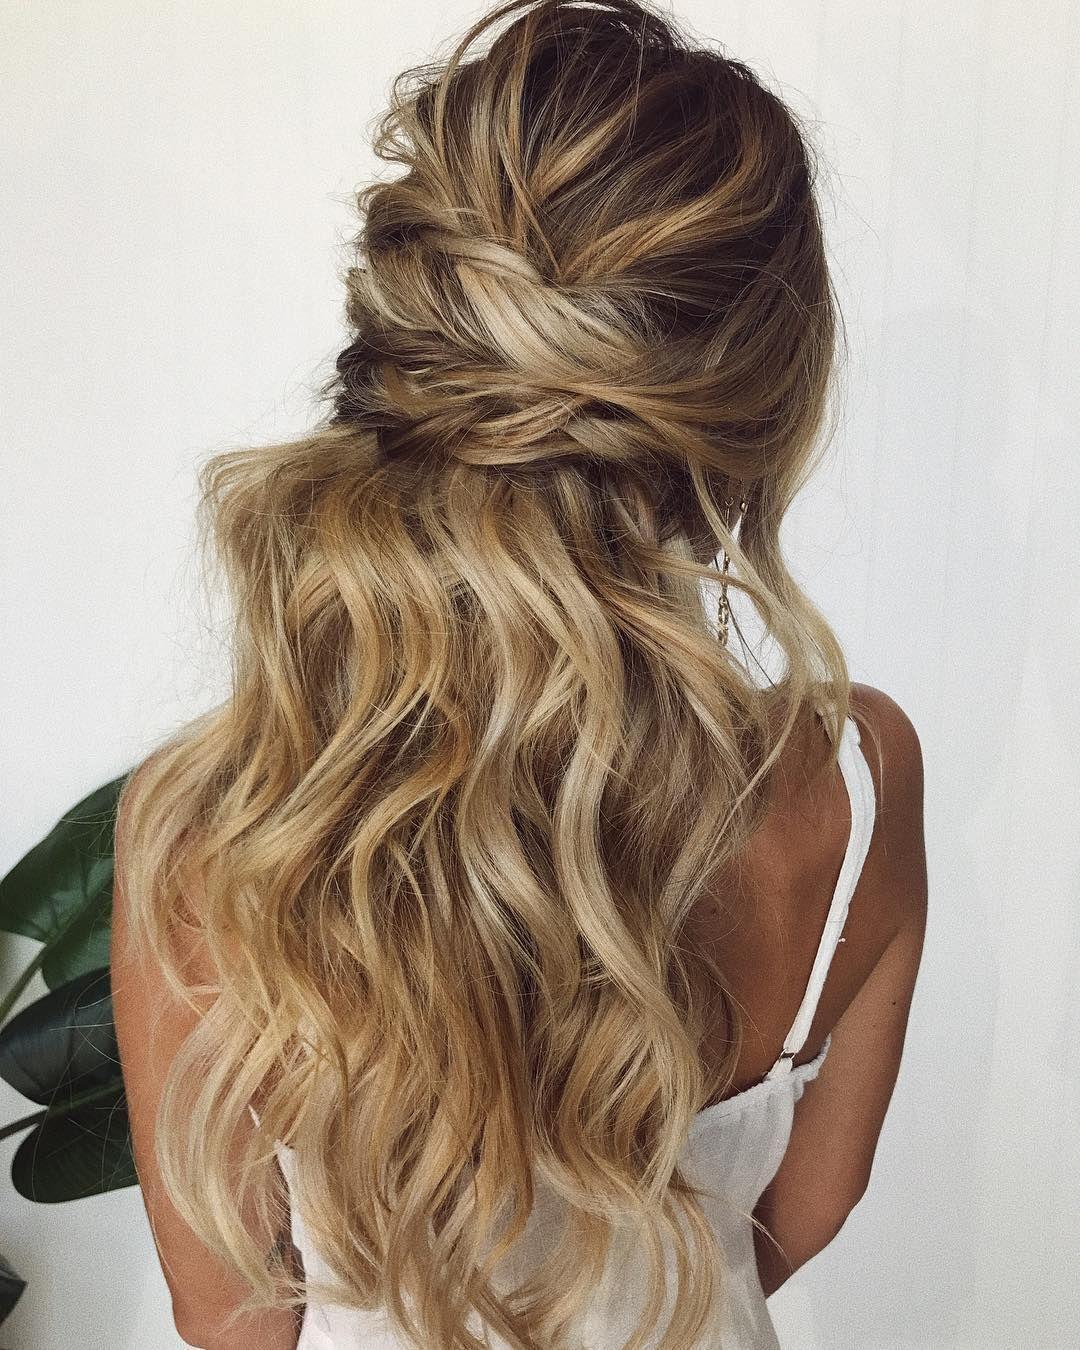 Hairstyle inspiration : Emma Chen